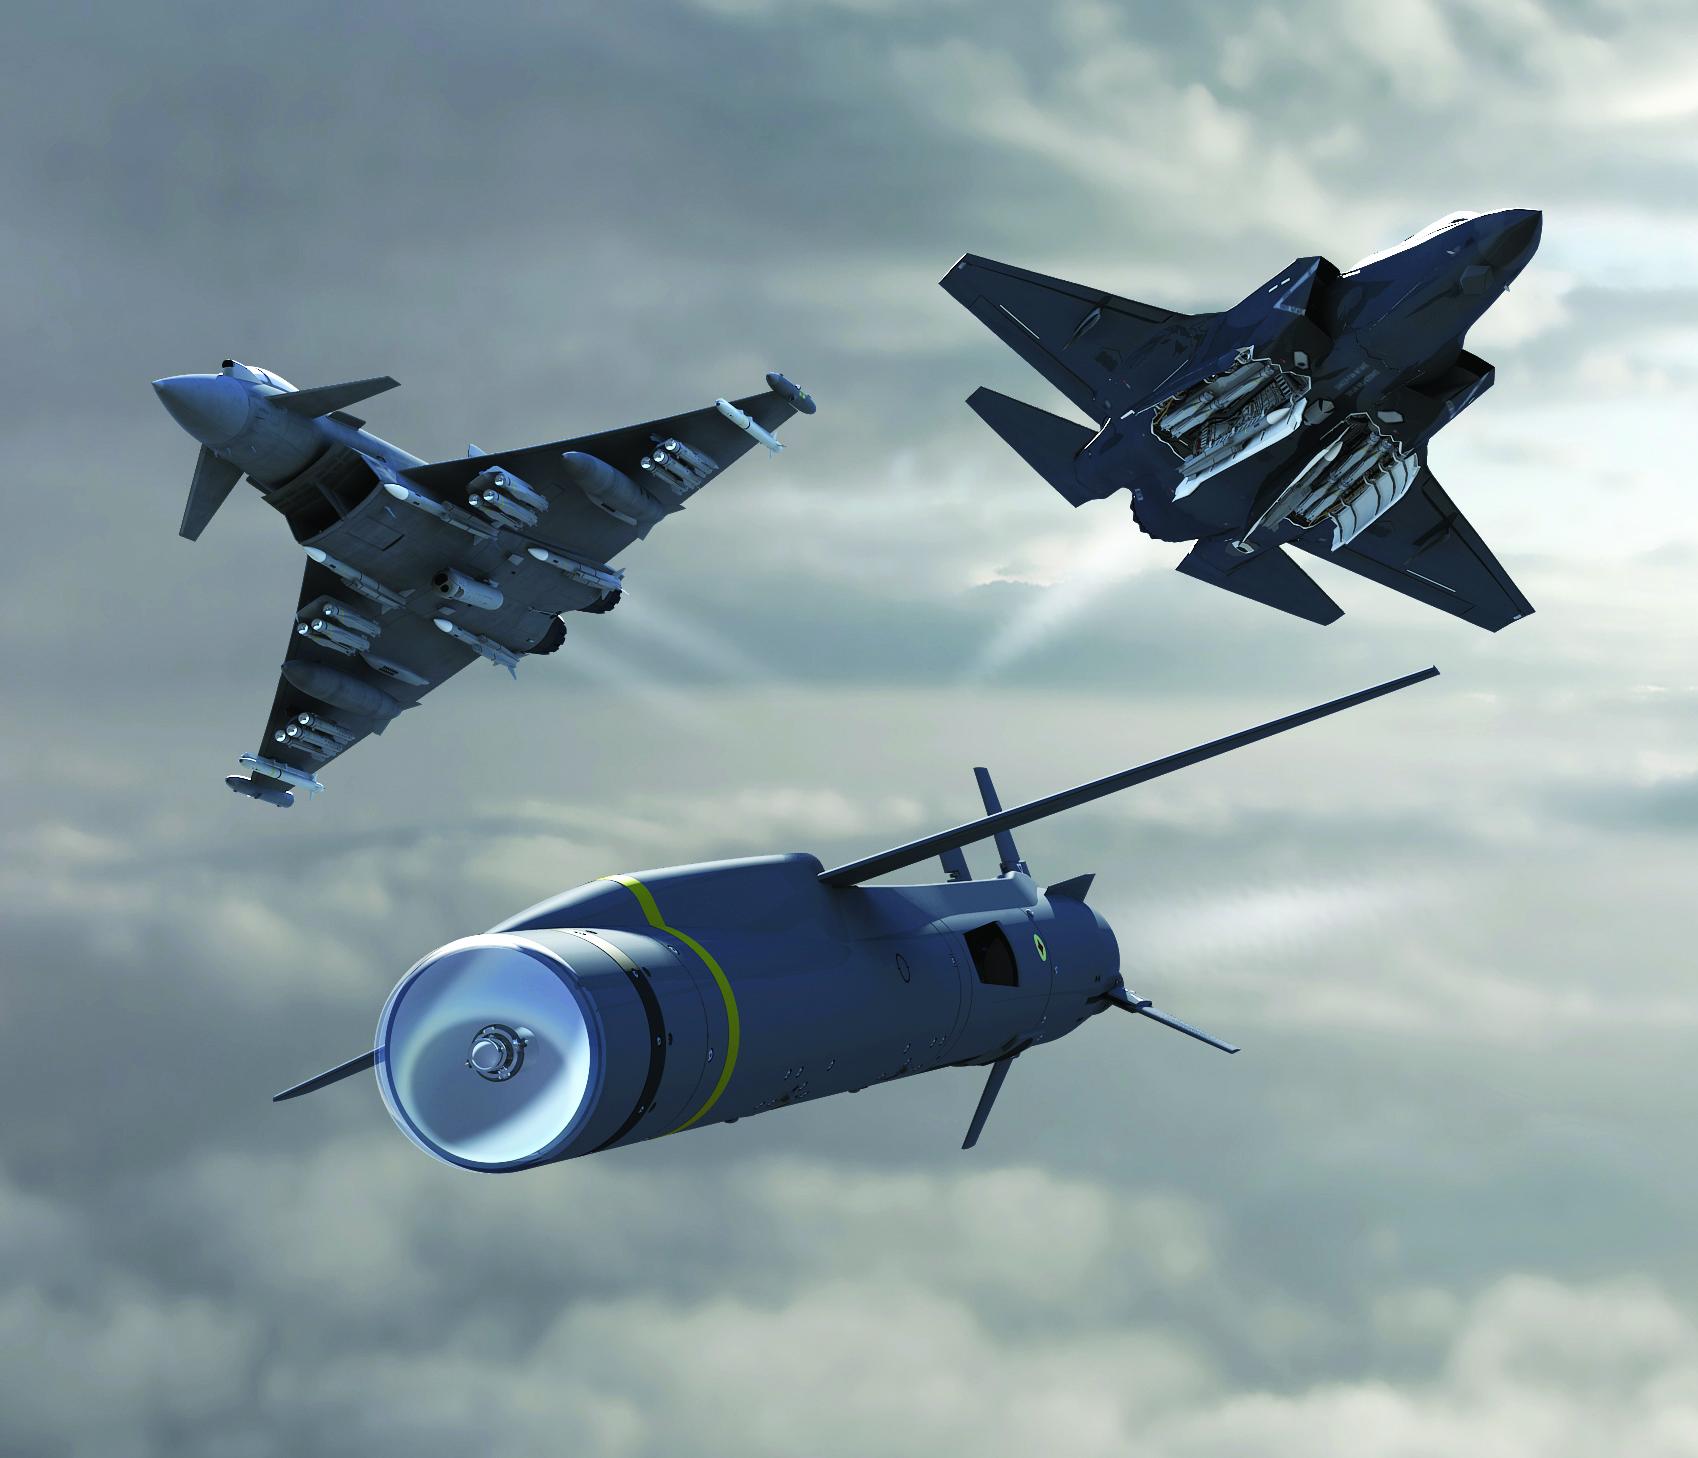 7976383af5 MBDA Showcases the SPEAR Precision Strike Missile for the F-35 - MBDA